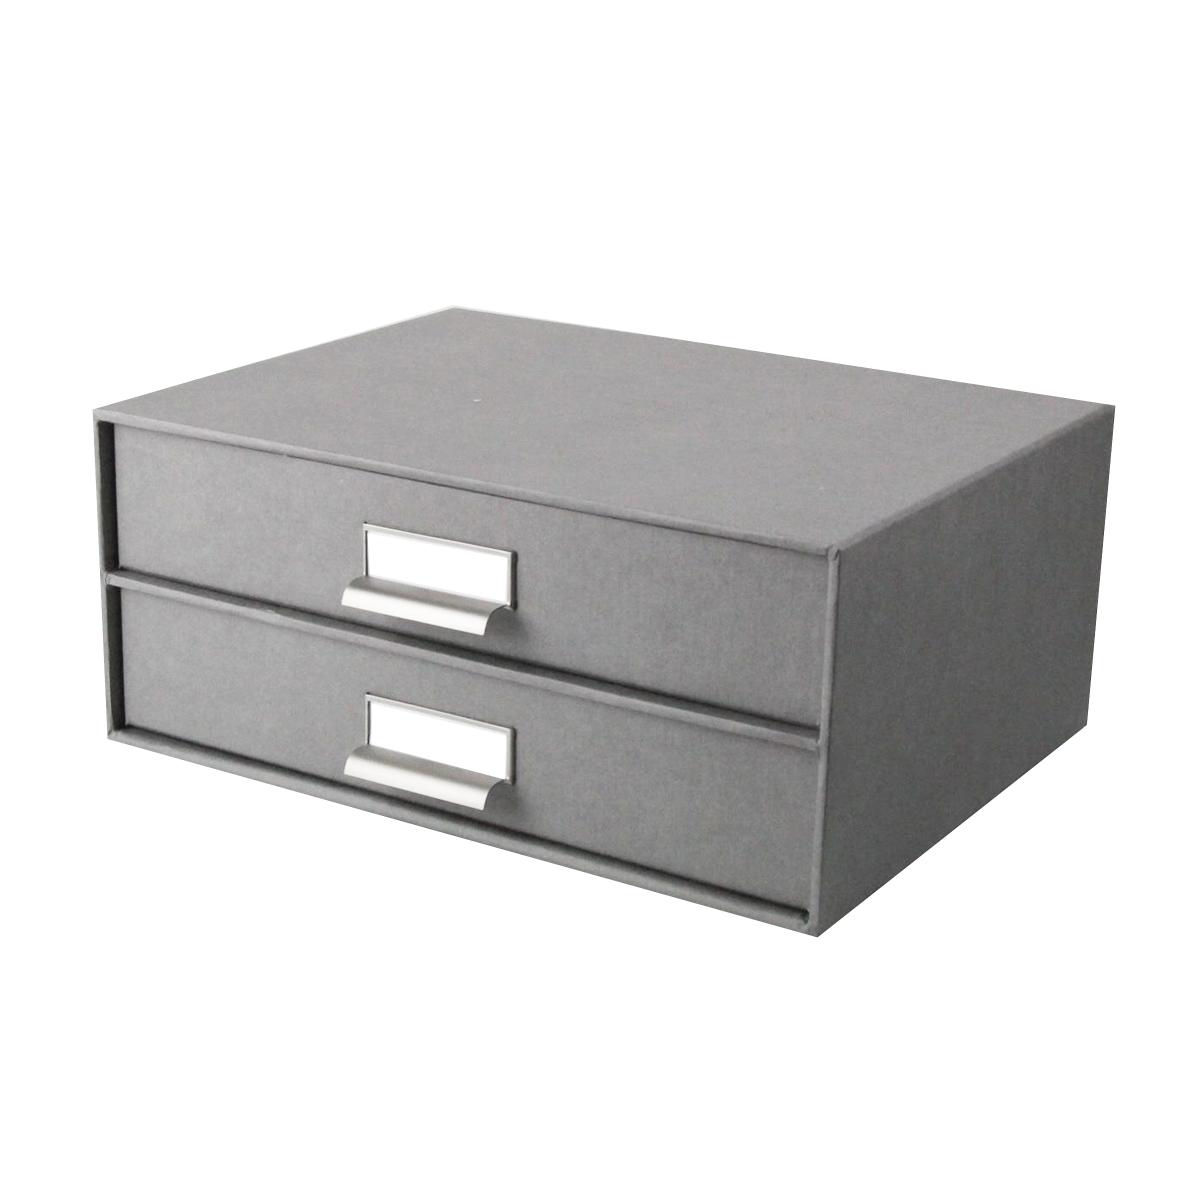 bo te tiroirs rangement bureau. Black Bedroom Furniture Sets. Home Design Ideas